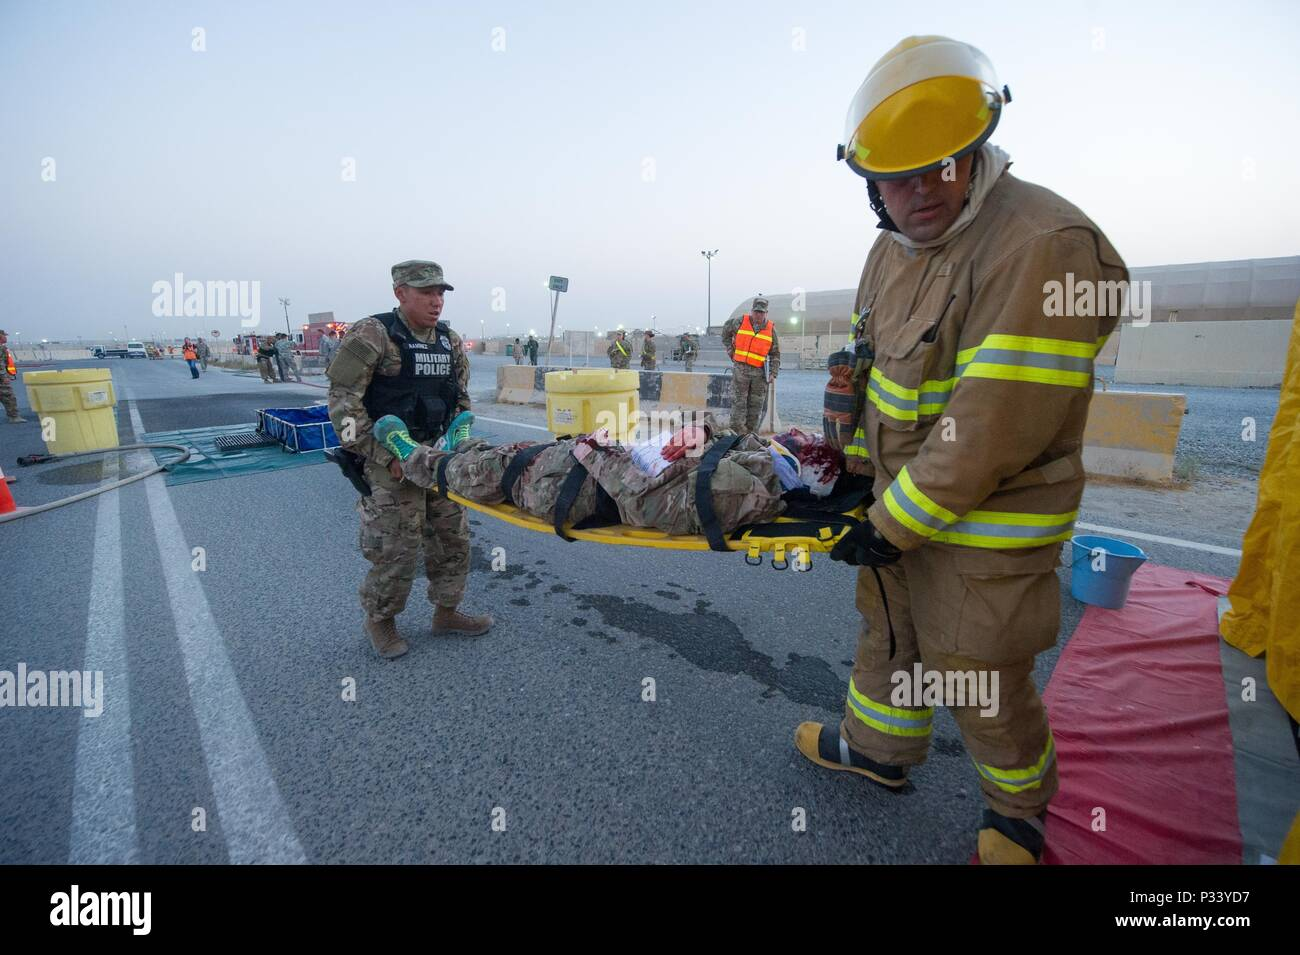 Asg Kuwait Stock Photos & Asg Kuwait Stock Images - Alamy